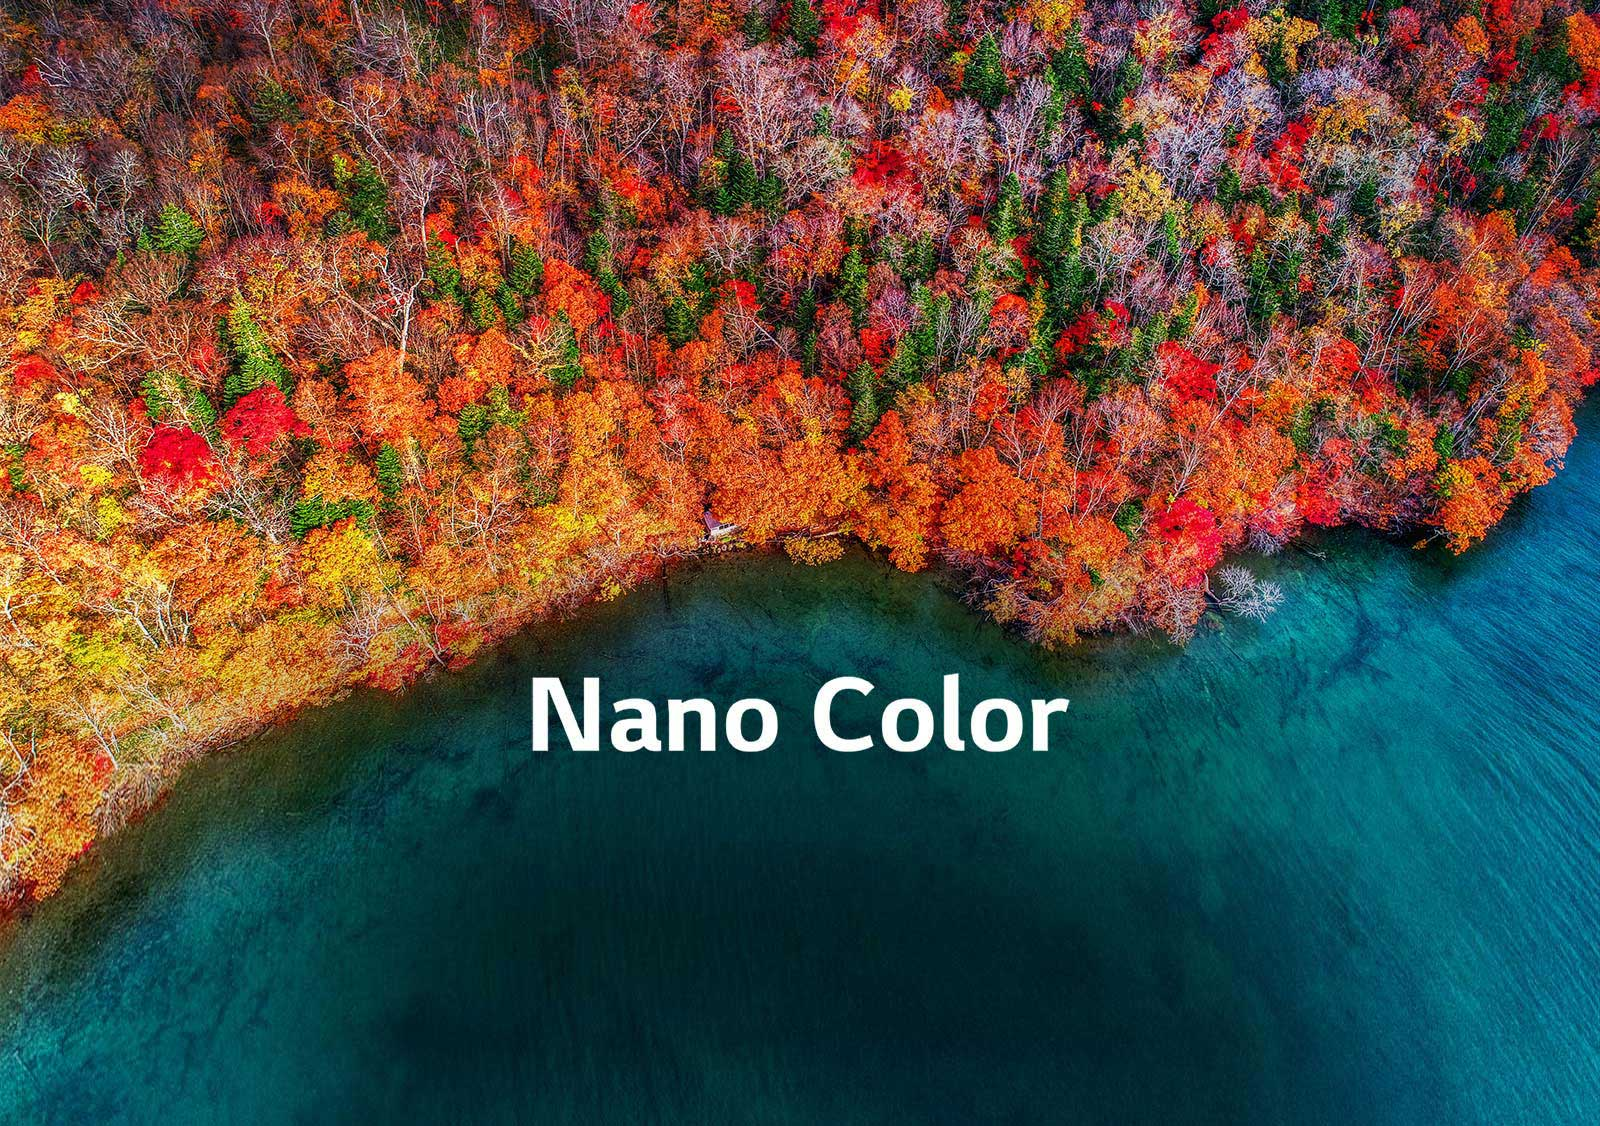 TV-NanoCell-SM94-02-Nano-Color-Desktop